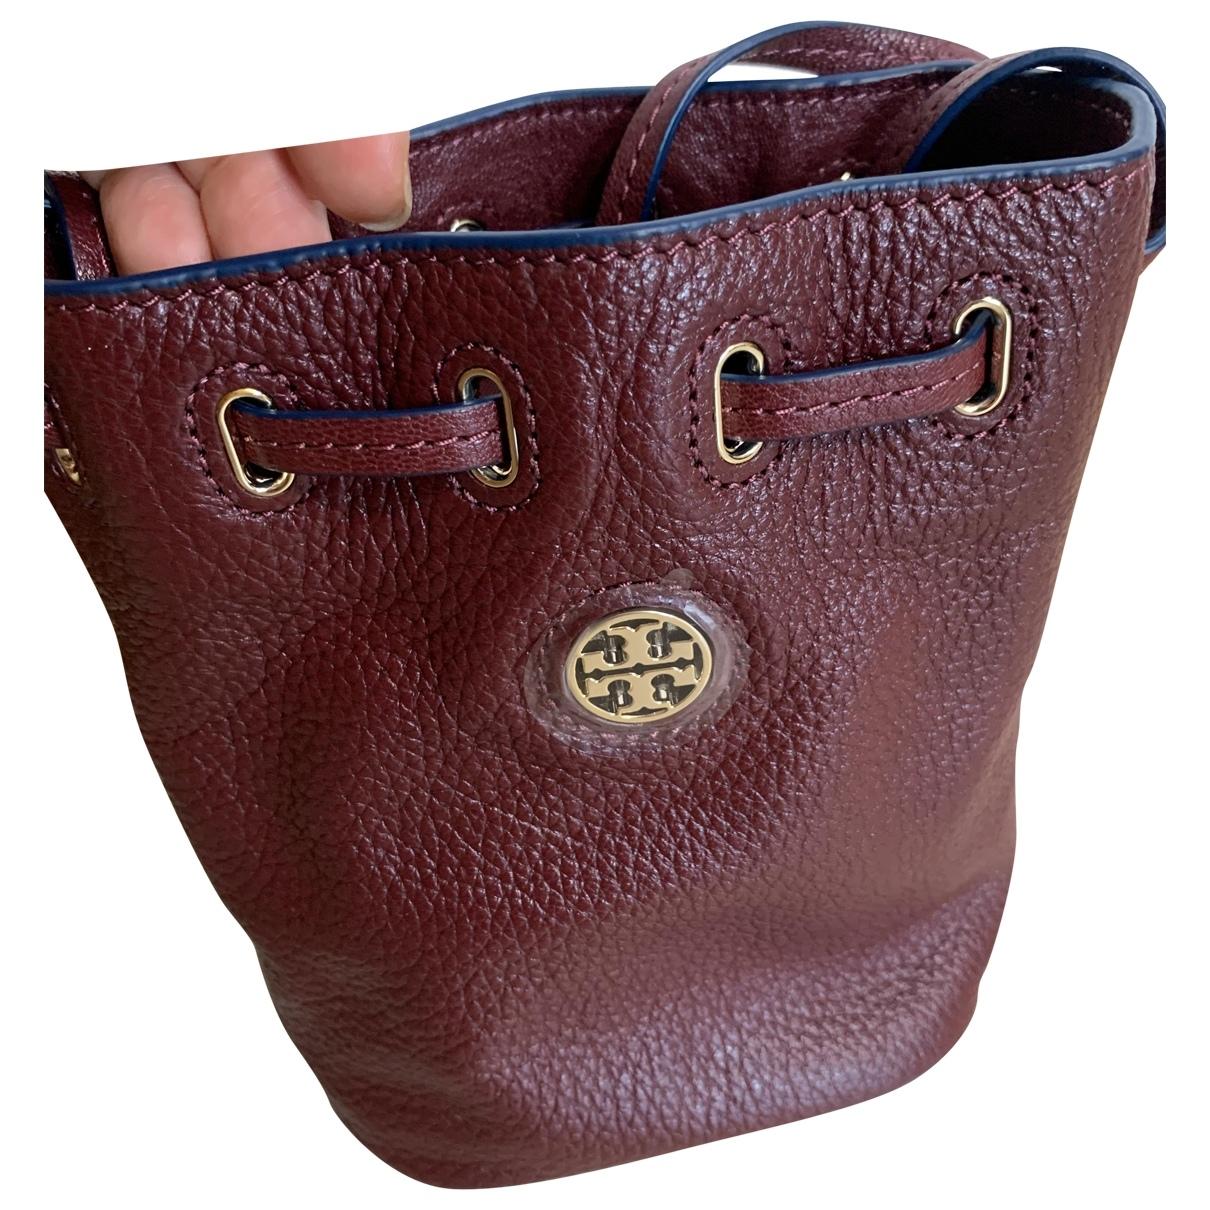 Tory Burch \N Handtasche in  Bordeauxrot Leder